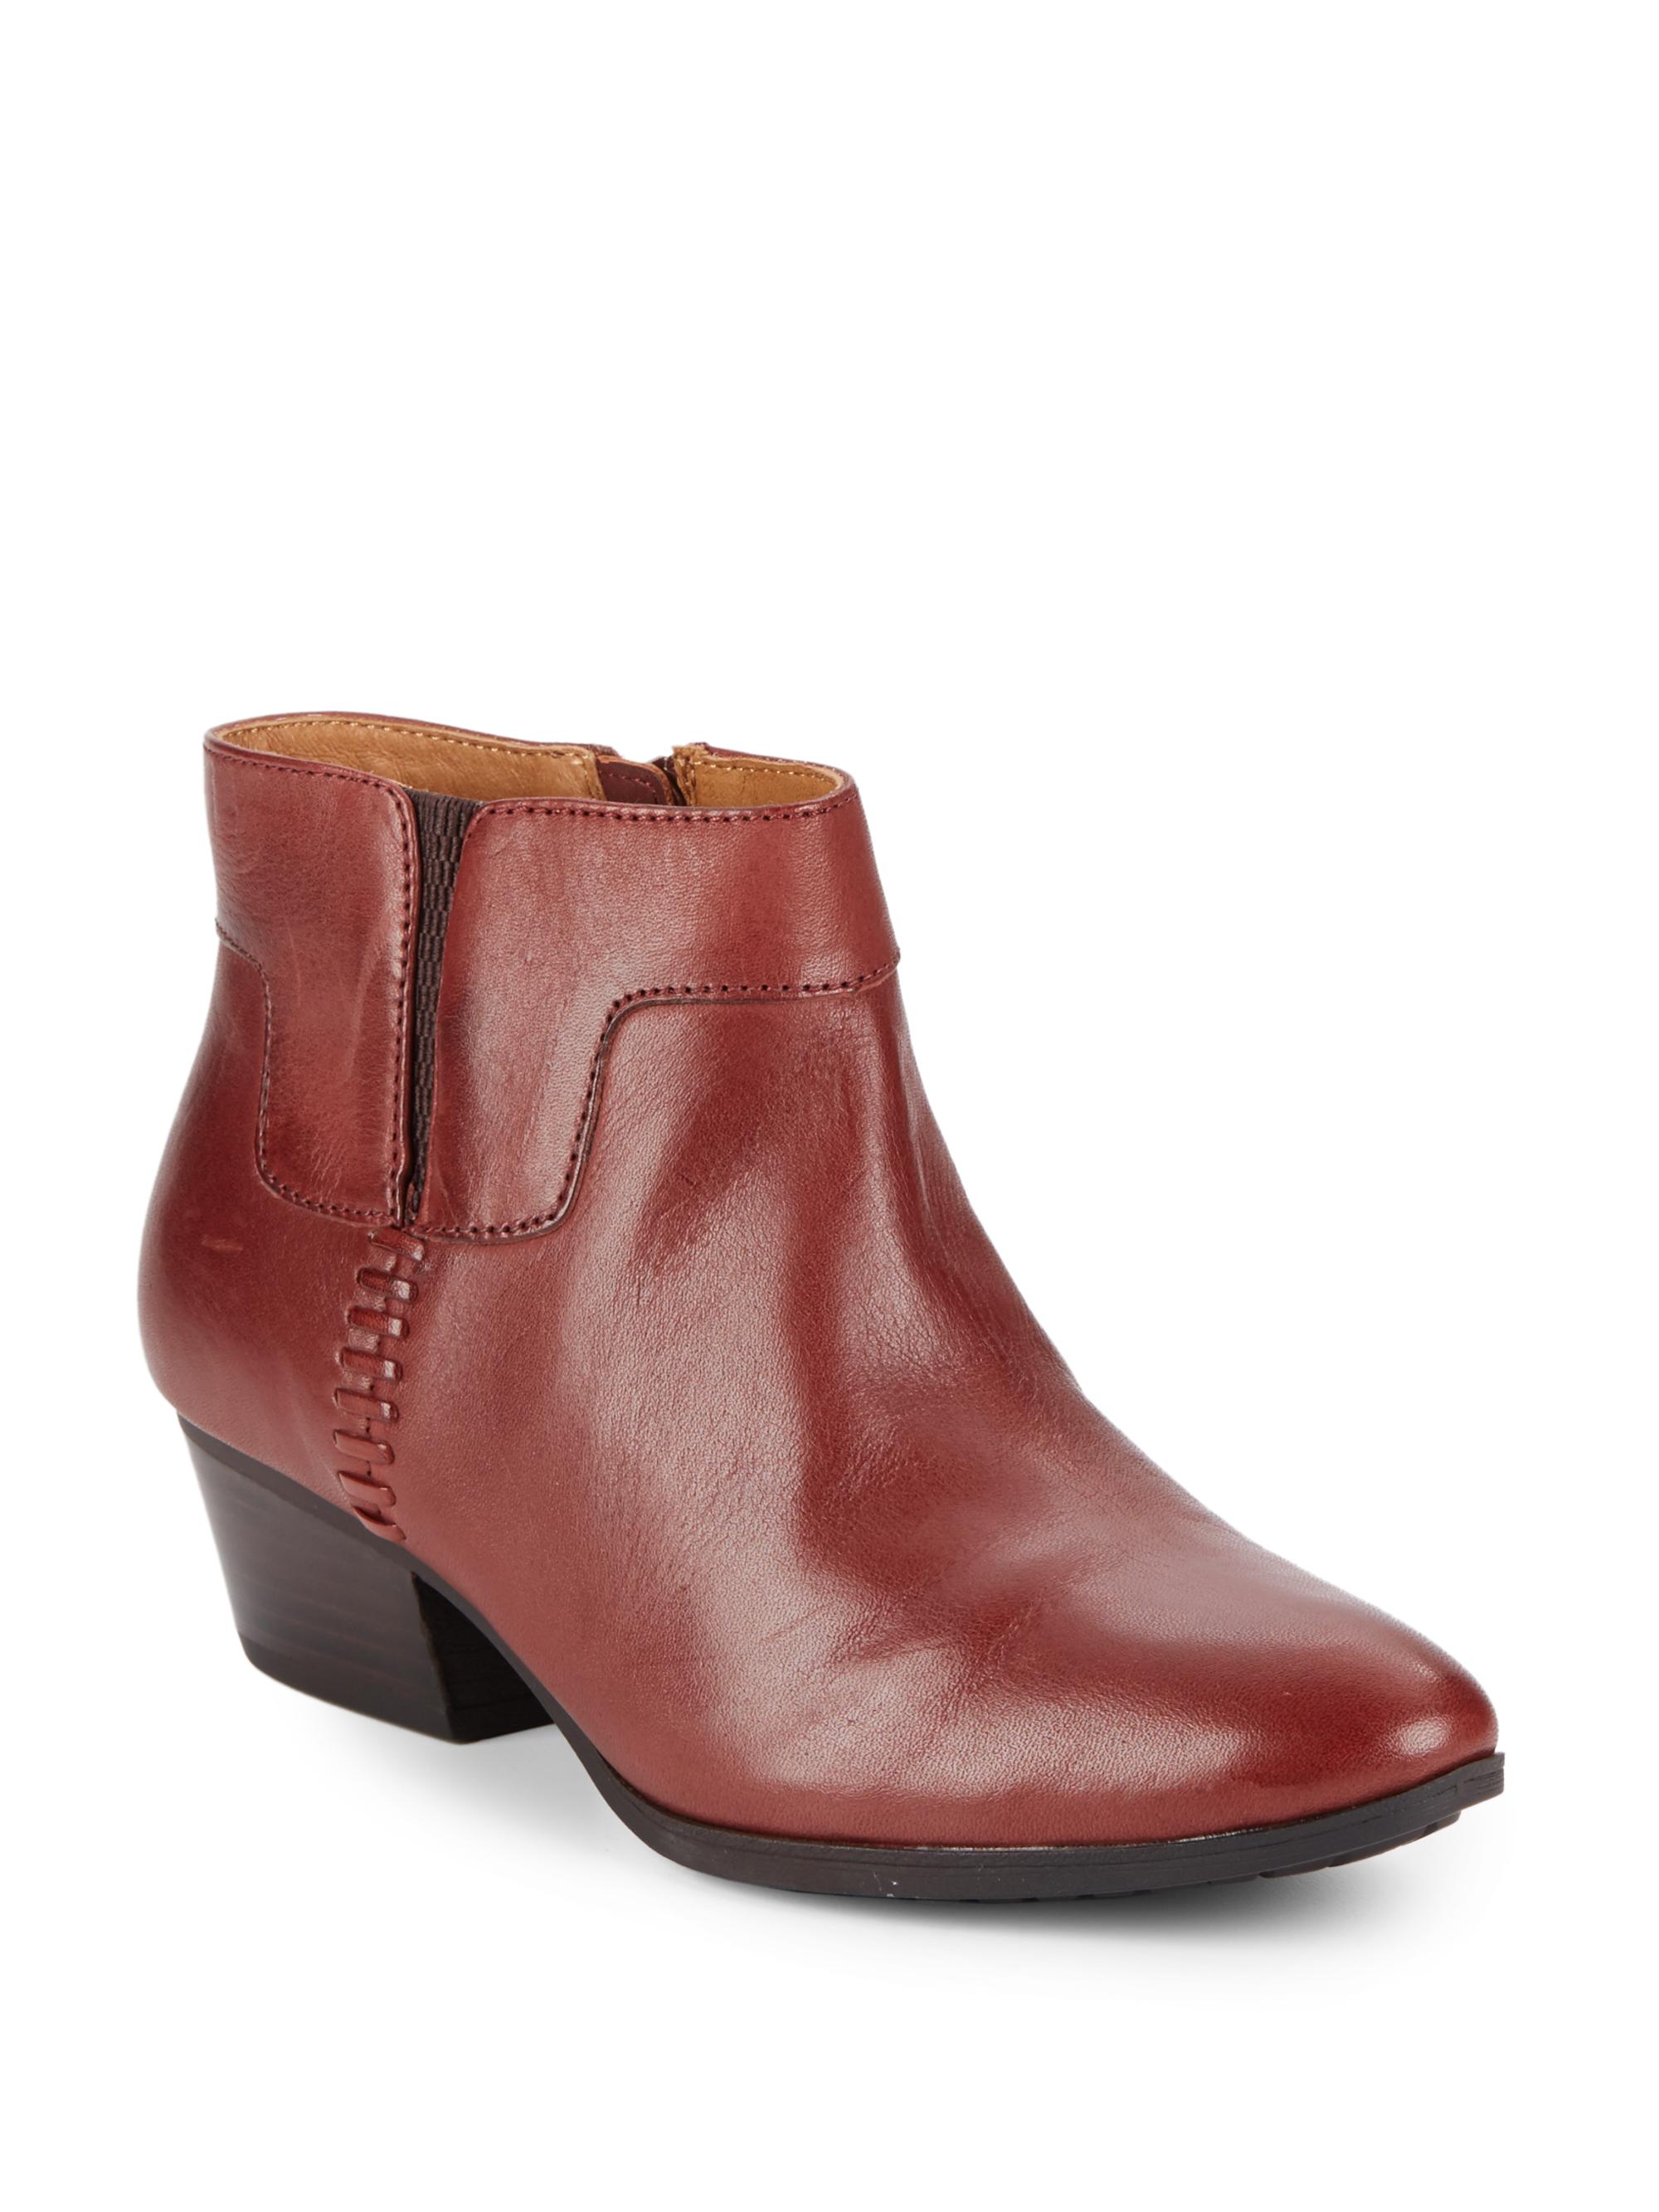 Shoes-021.JPG